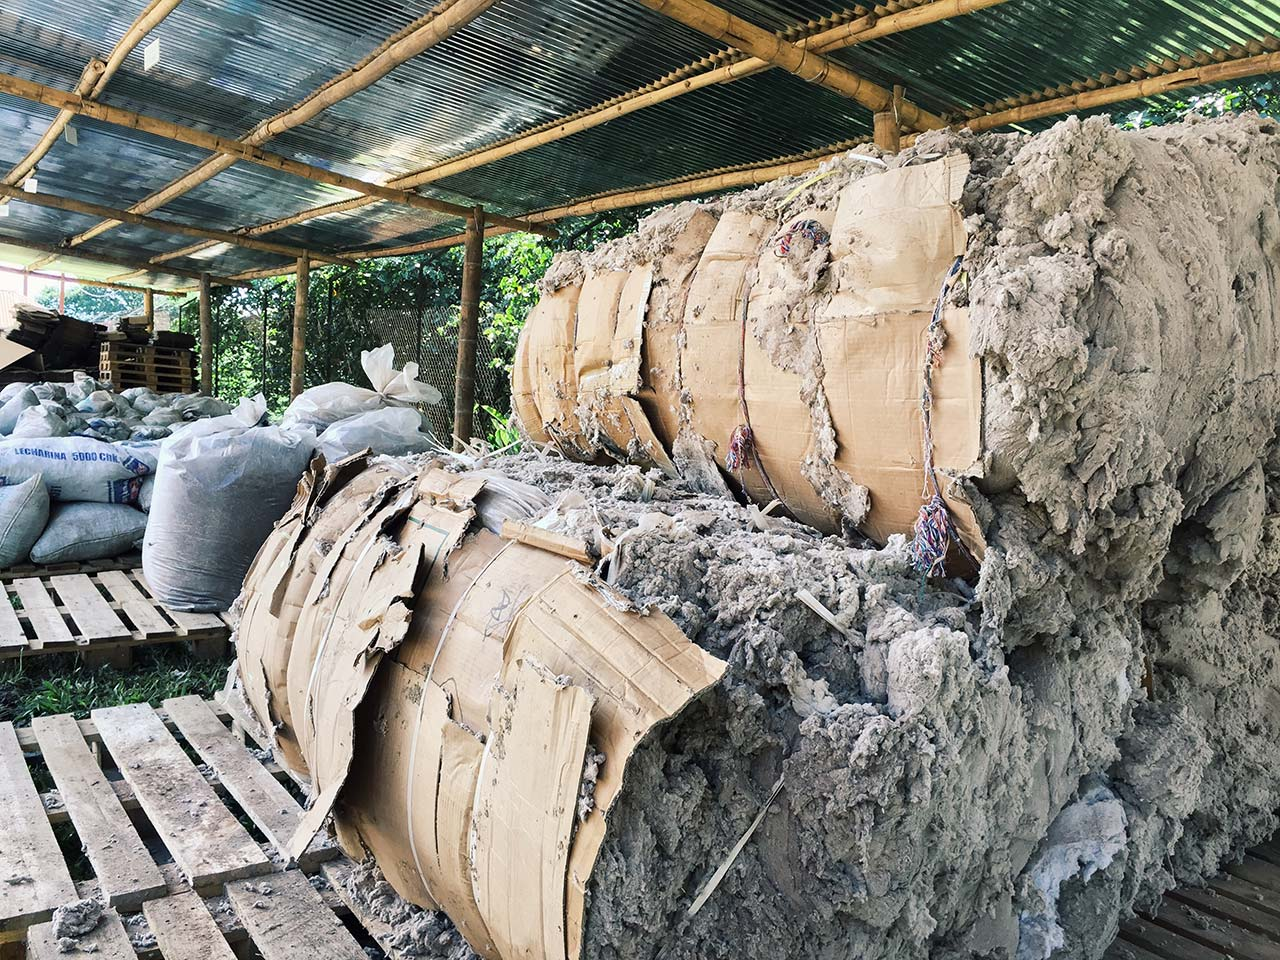 Denim waste fiber